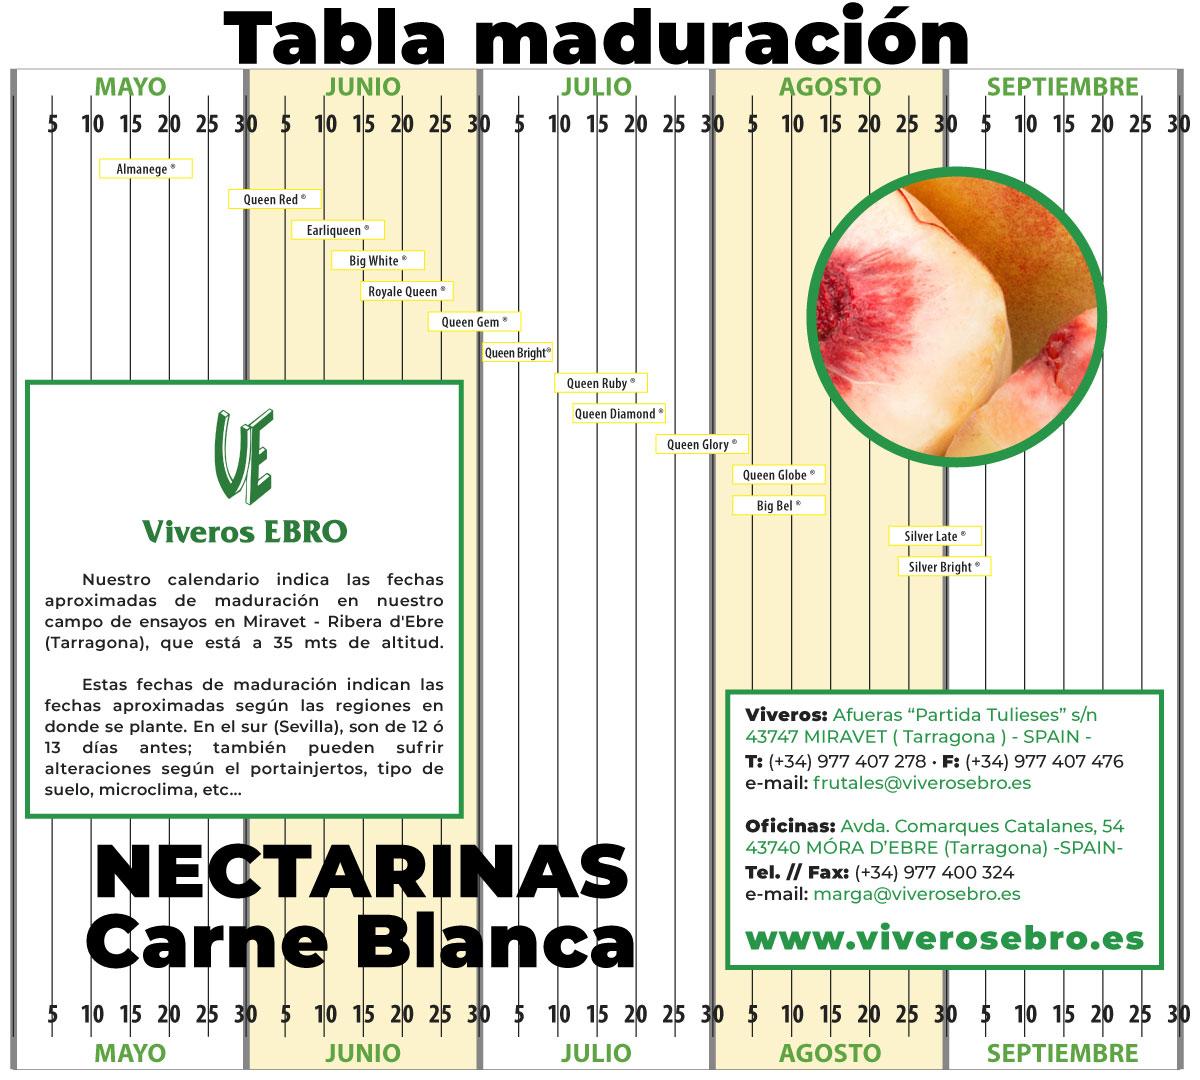 Cuadro Maduracion Nectarina Blanca 2021